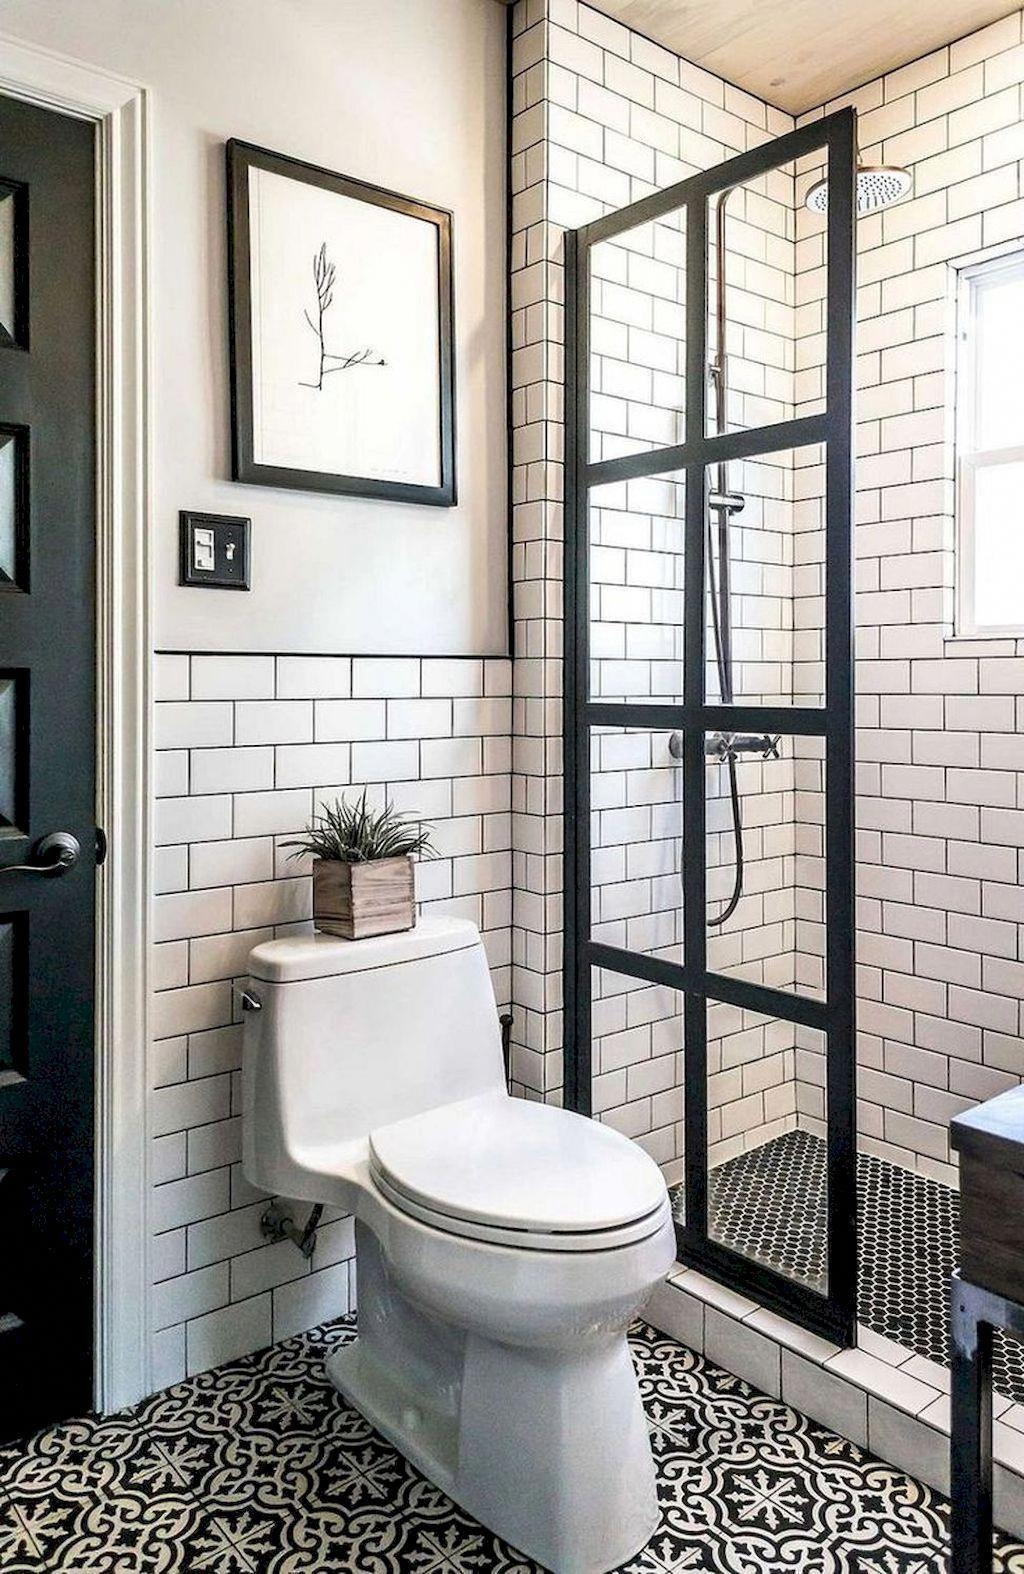 Facts On Beautiful Showers Do It Yourself Bathroomideasn Bathroomremodelfromhell Bathroomrenovationsadelaide